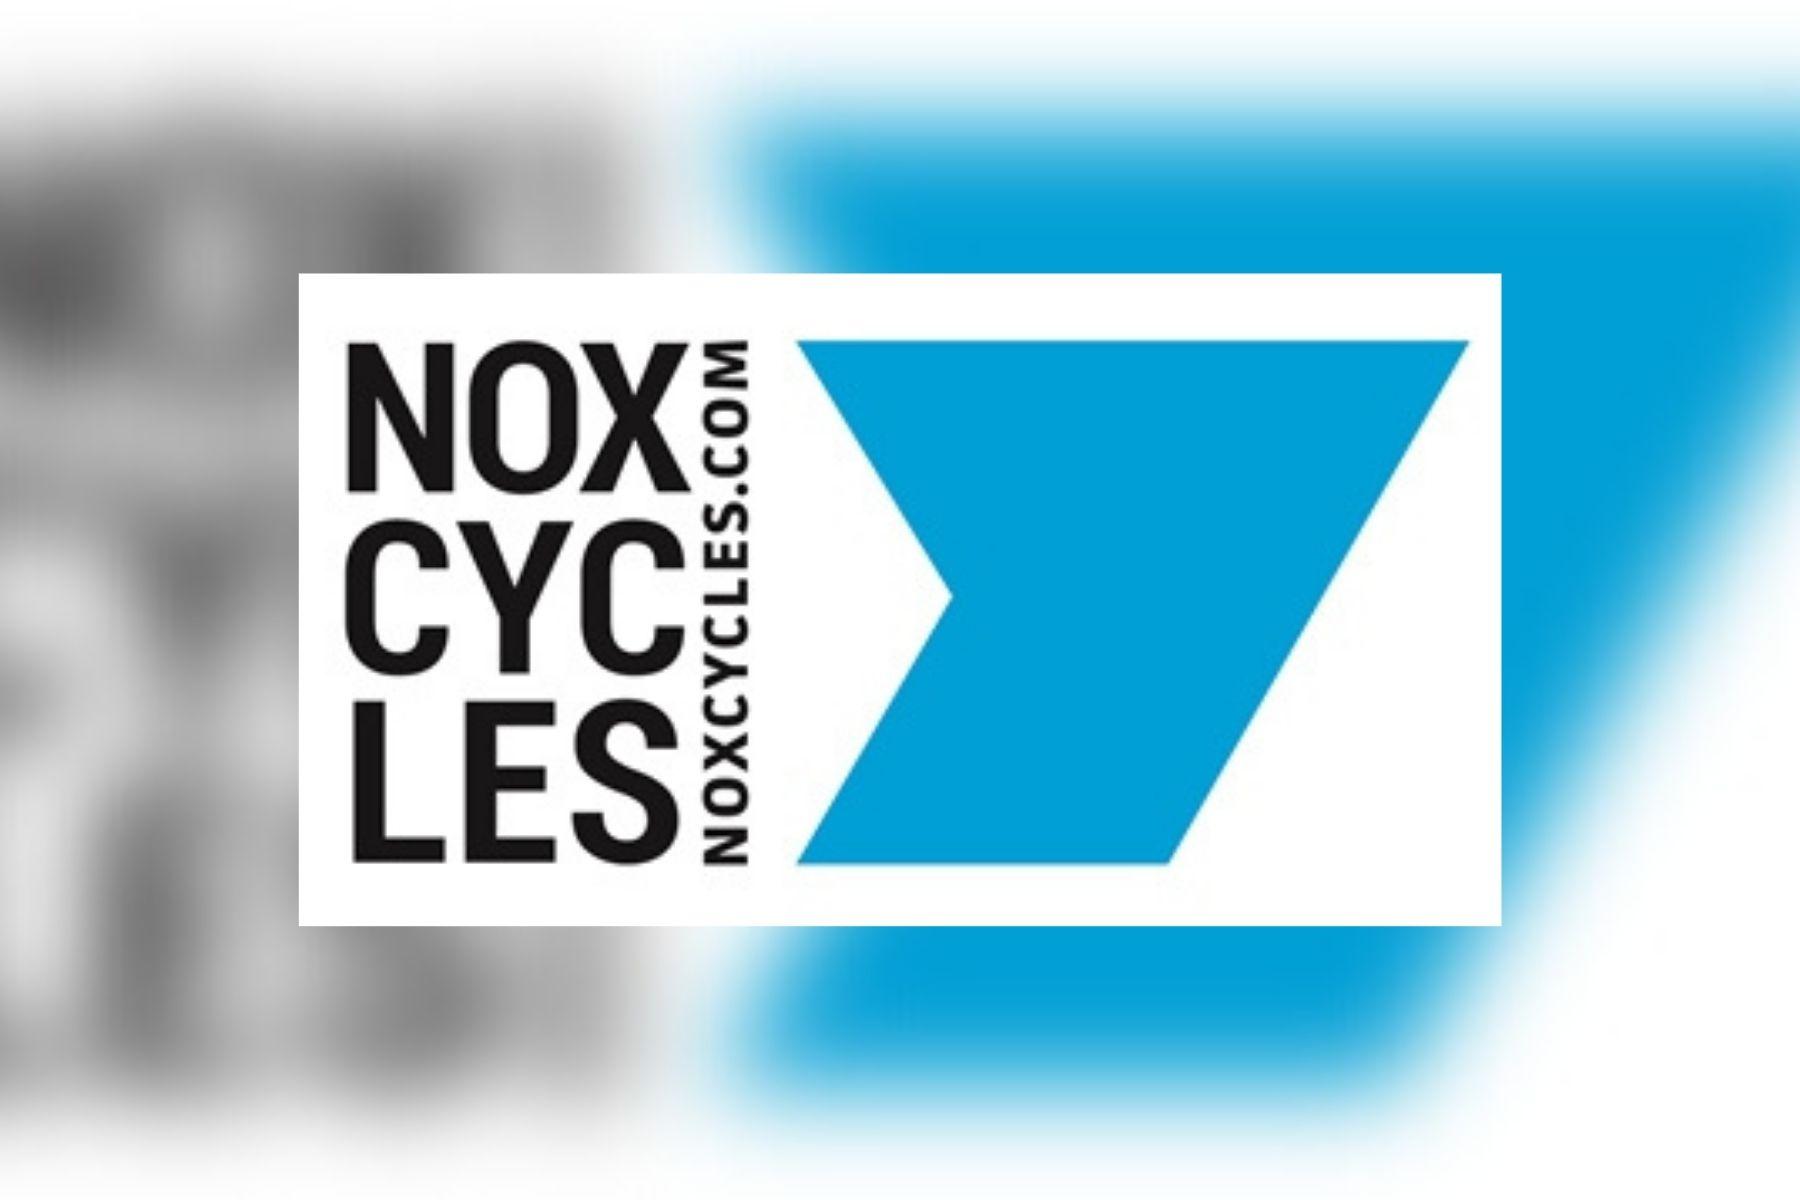 NOX Cycles expandiert in US-Markt